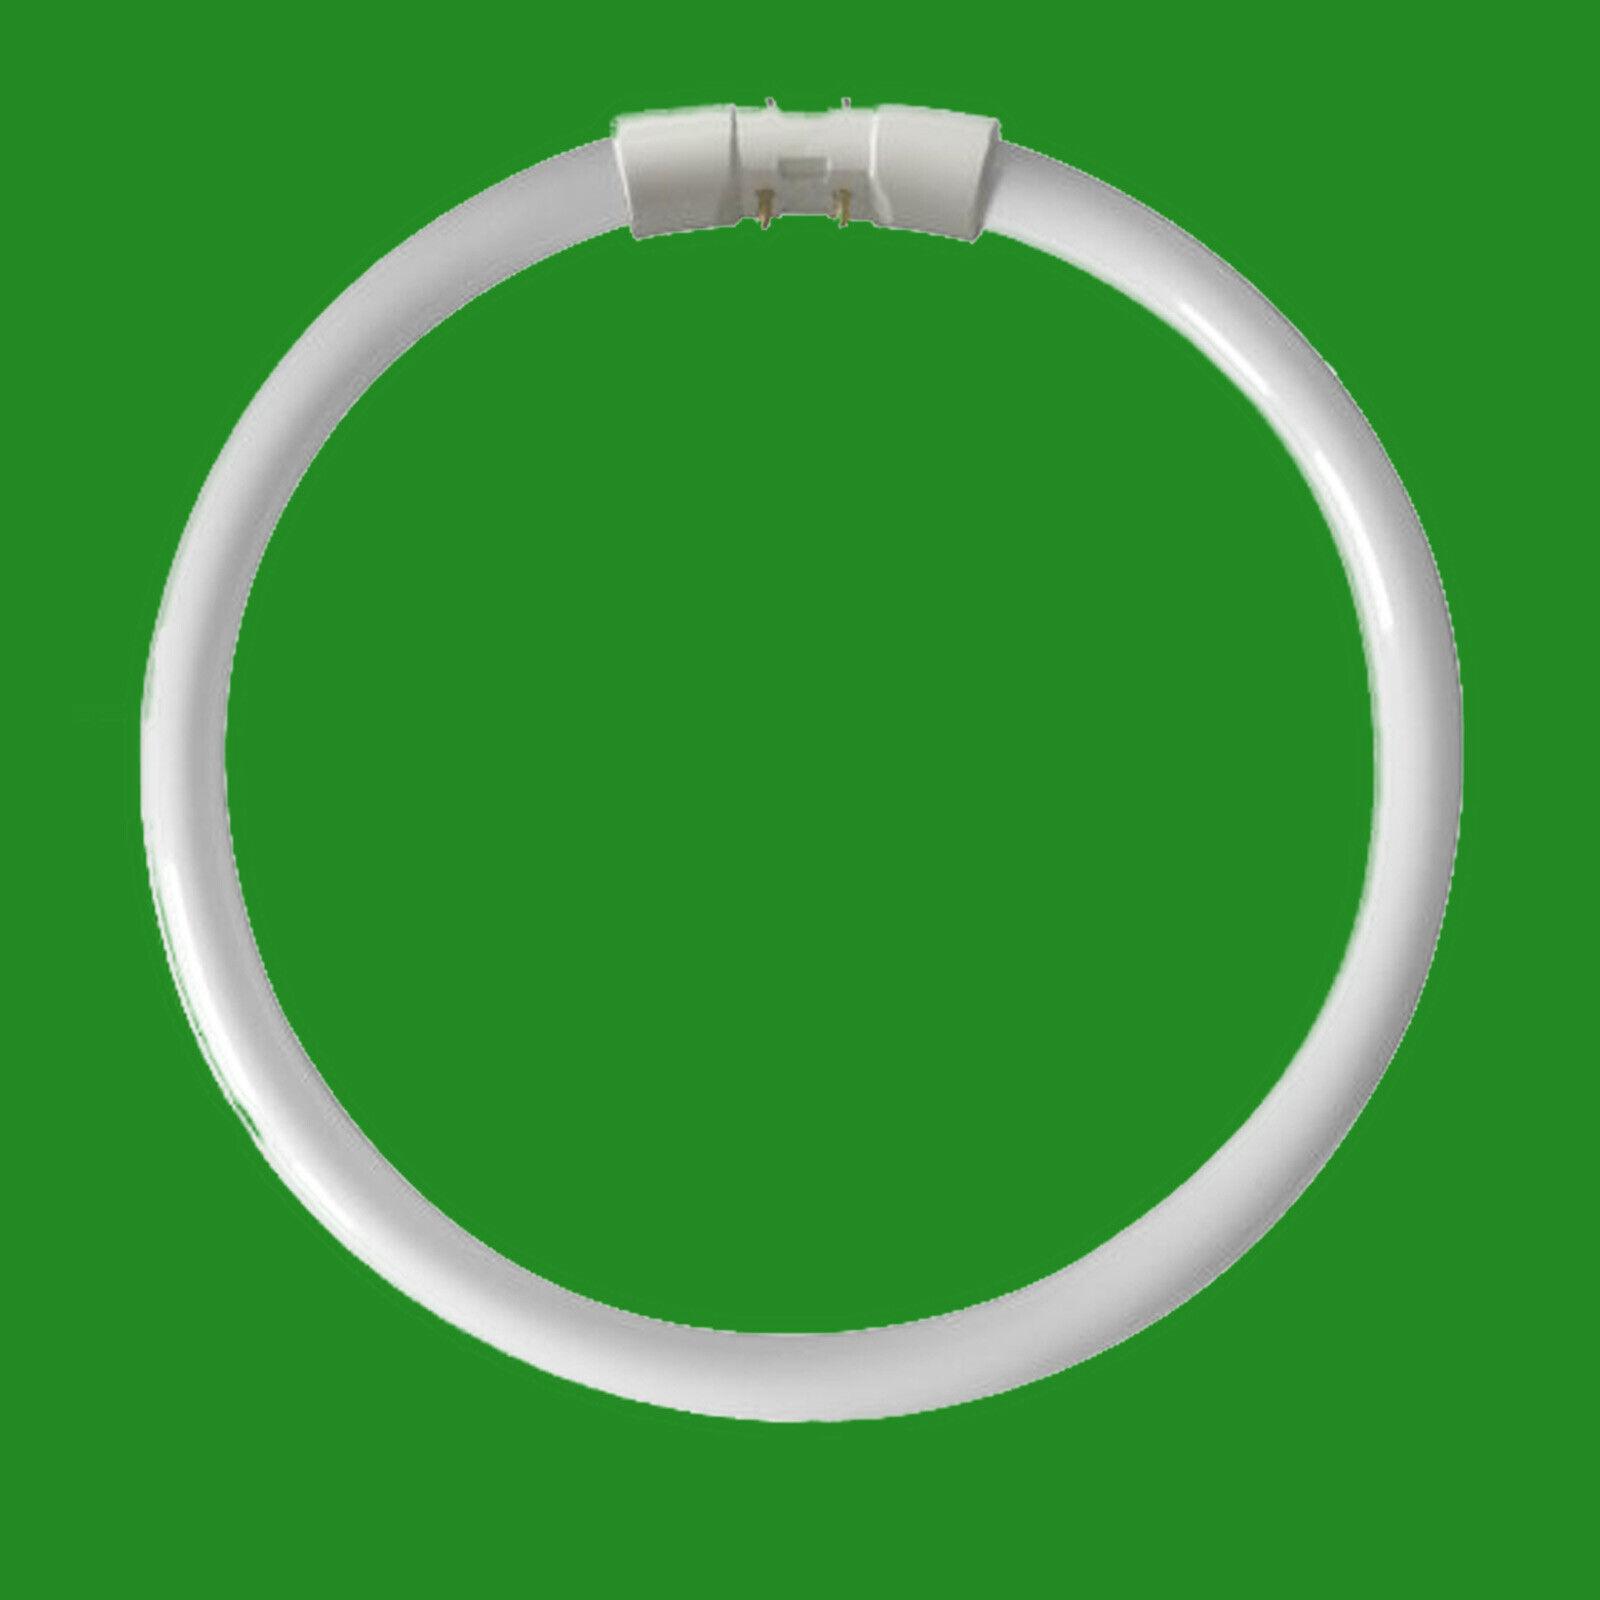 6x 22W 2GX13 4 Pin T5C Circular 228mm Lamp Fluorescent Tube 4000K Light Bulb